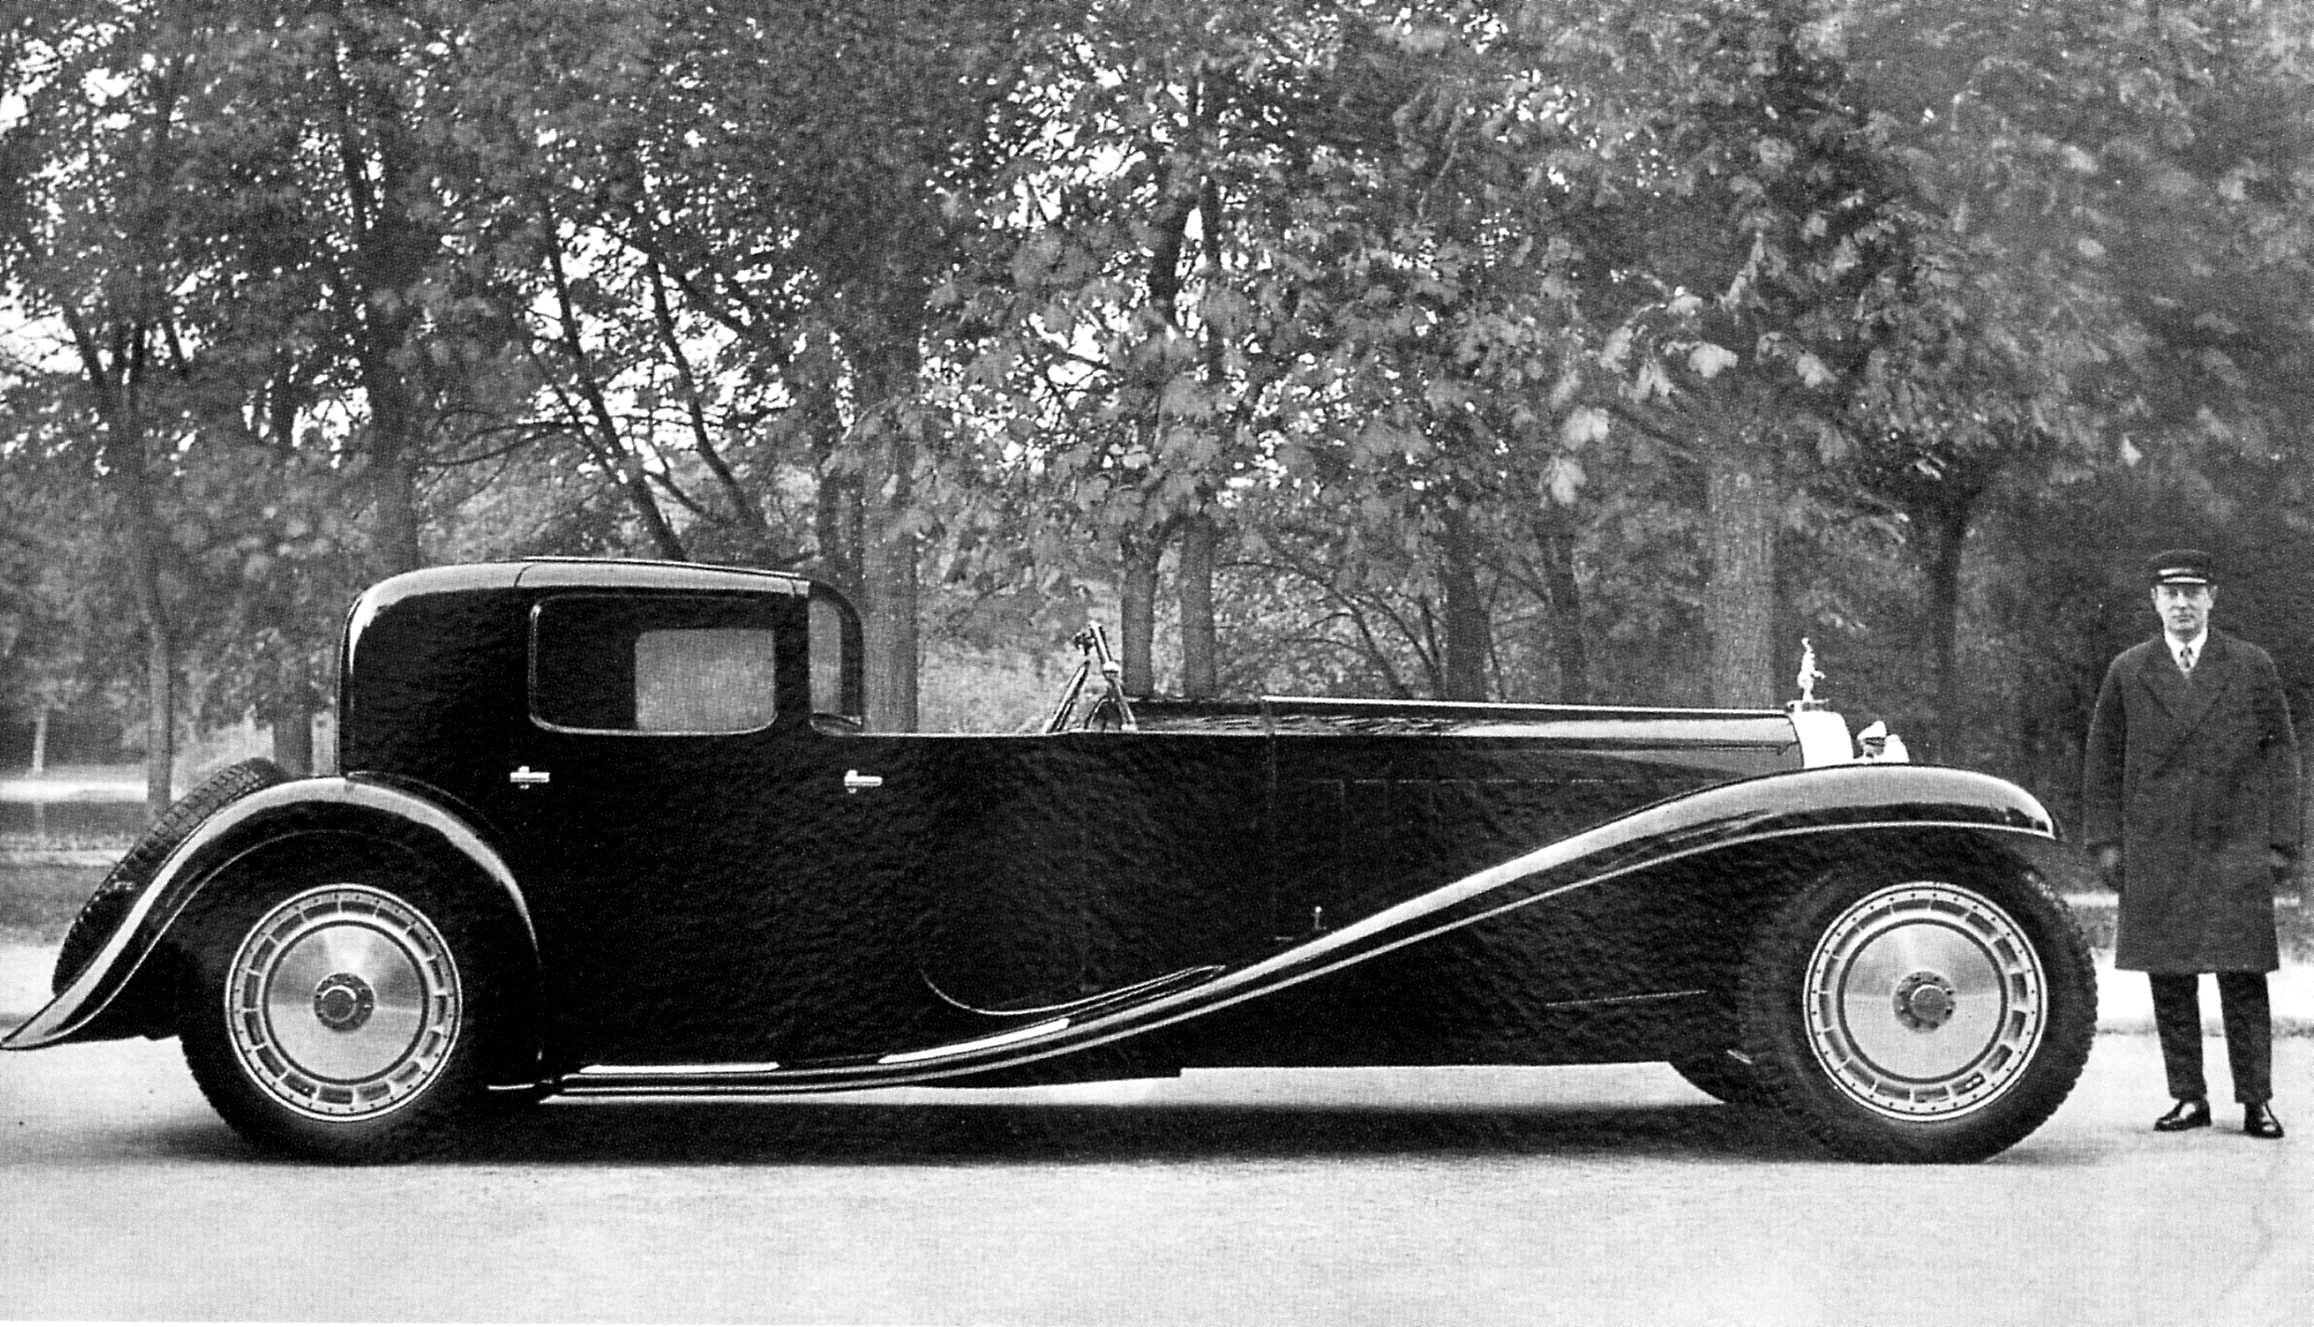 1927 Bugatti Type 41 Royale - Milestones on bugatti type 53, bugatti type 40, bugatti type 50, bugatti type 16, bugatti type 4, bugatti type 11, bugatti type 15, bugatti type 78, bugatti type 46, bugatti veyron, bugatti type 101, bugatti 16c galibier, bugatti type 37, bugatti z type, bugatti type 3, bugatti type 1, bugatti motorcycle, bugatti type 10, bugatti type 5, bugatti type 35,